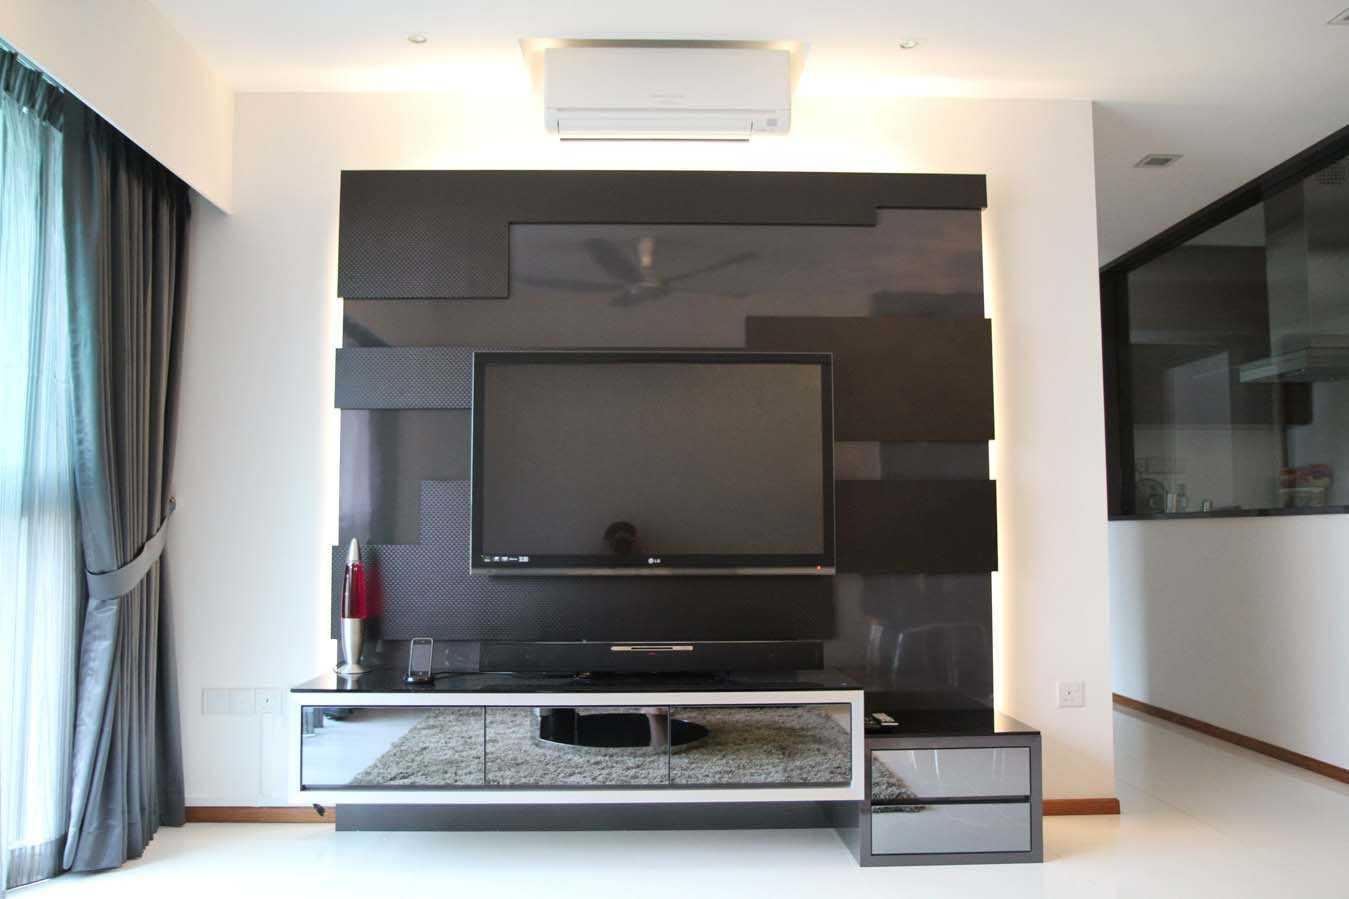 tv unit designs tv cabinet design tv wall unit design lcd panel design lcd unit design & 20 Modern TV Unit Design Ideas For Bedroom \u0026 Living Room With Pictures